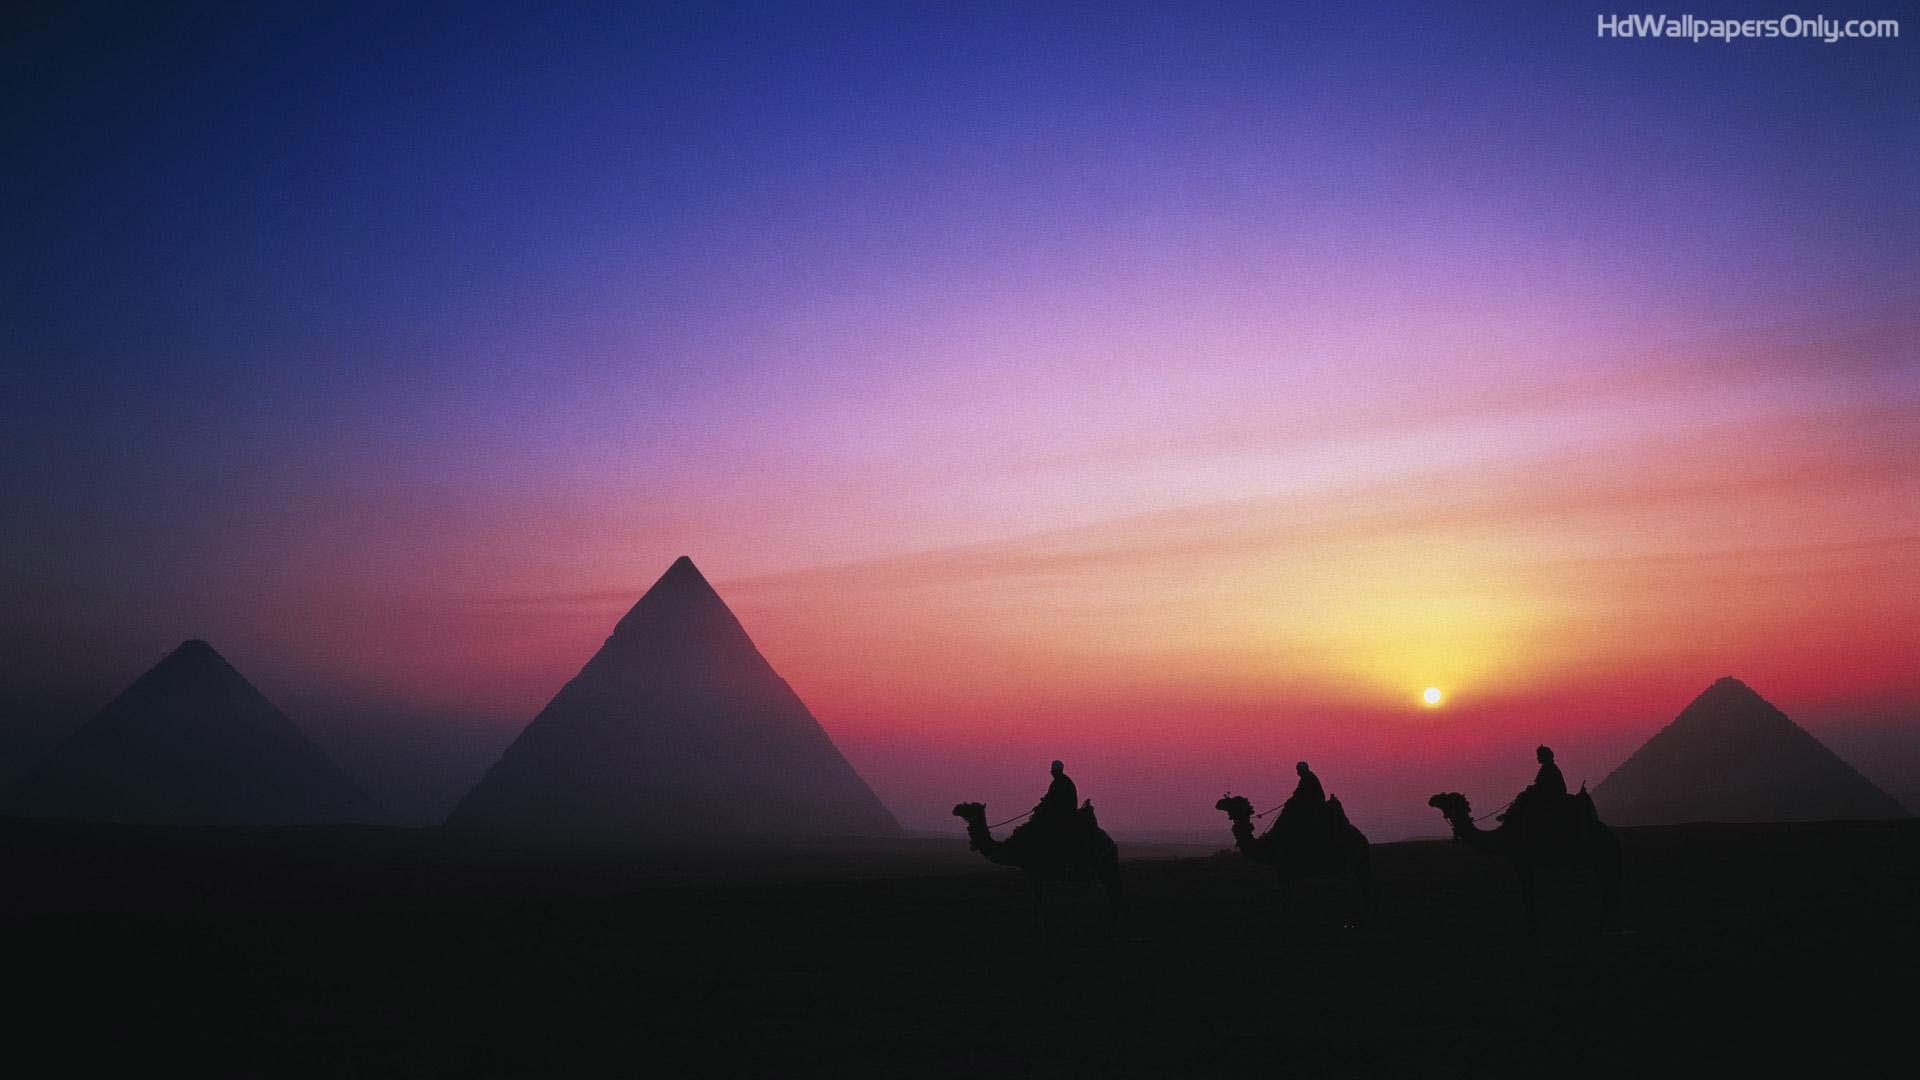 egypt deskto